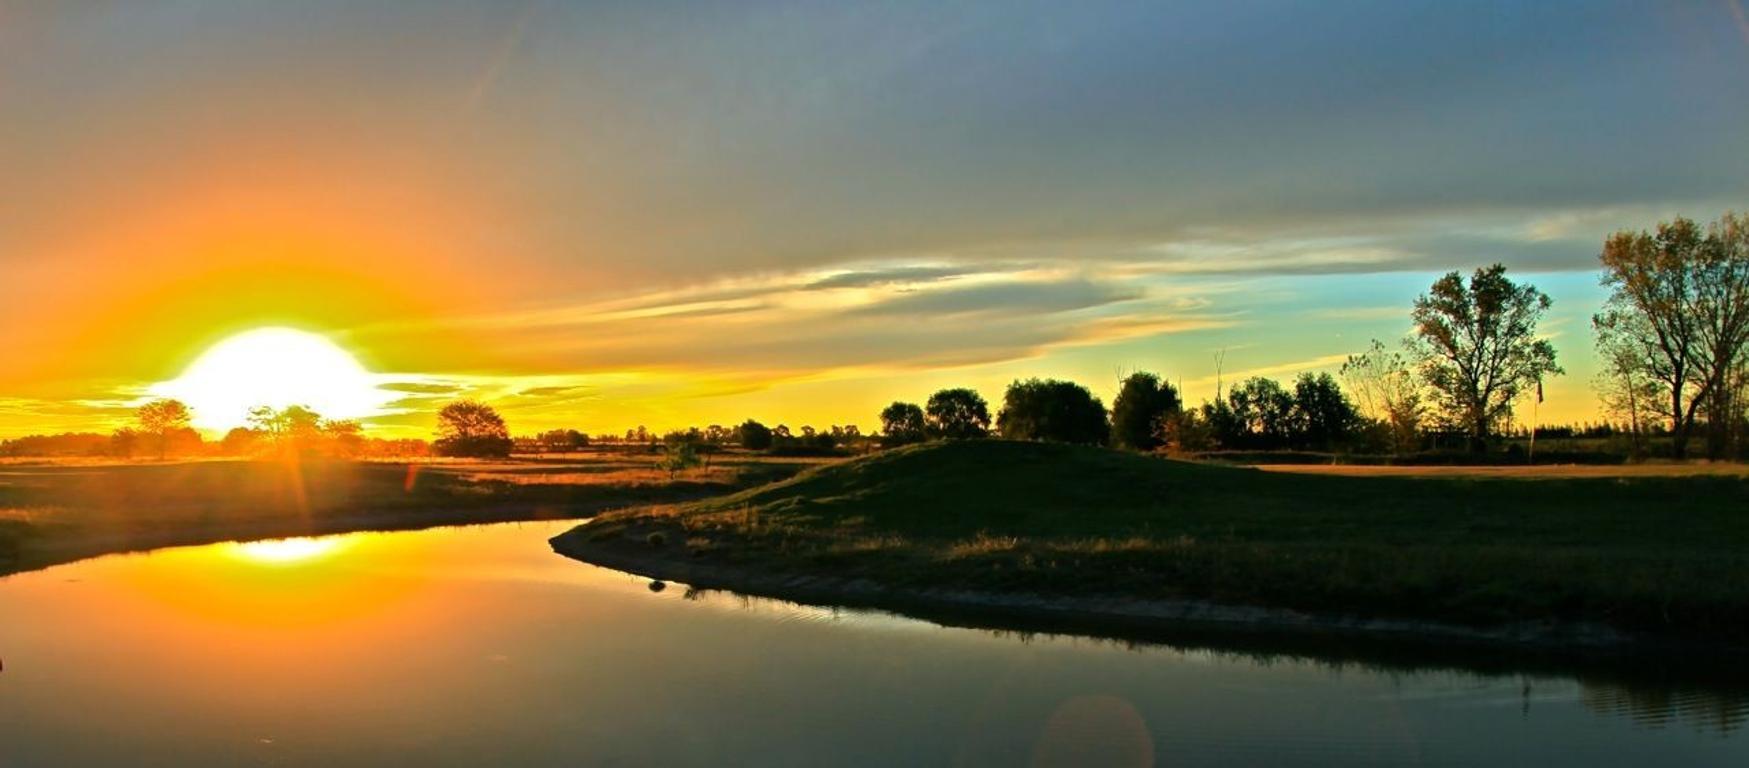 Tizado Pilar Lote terreno en venta con Golf en Medal Pilar - PIL3858_LP174096_1